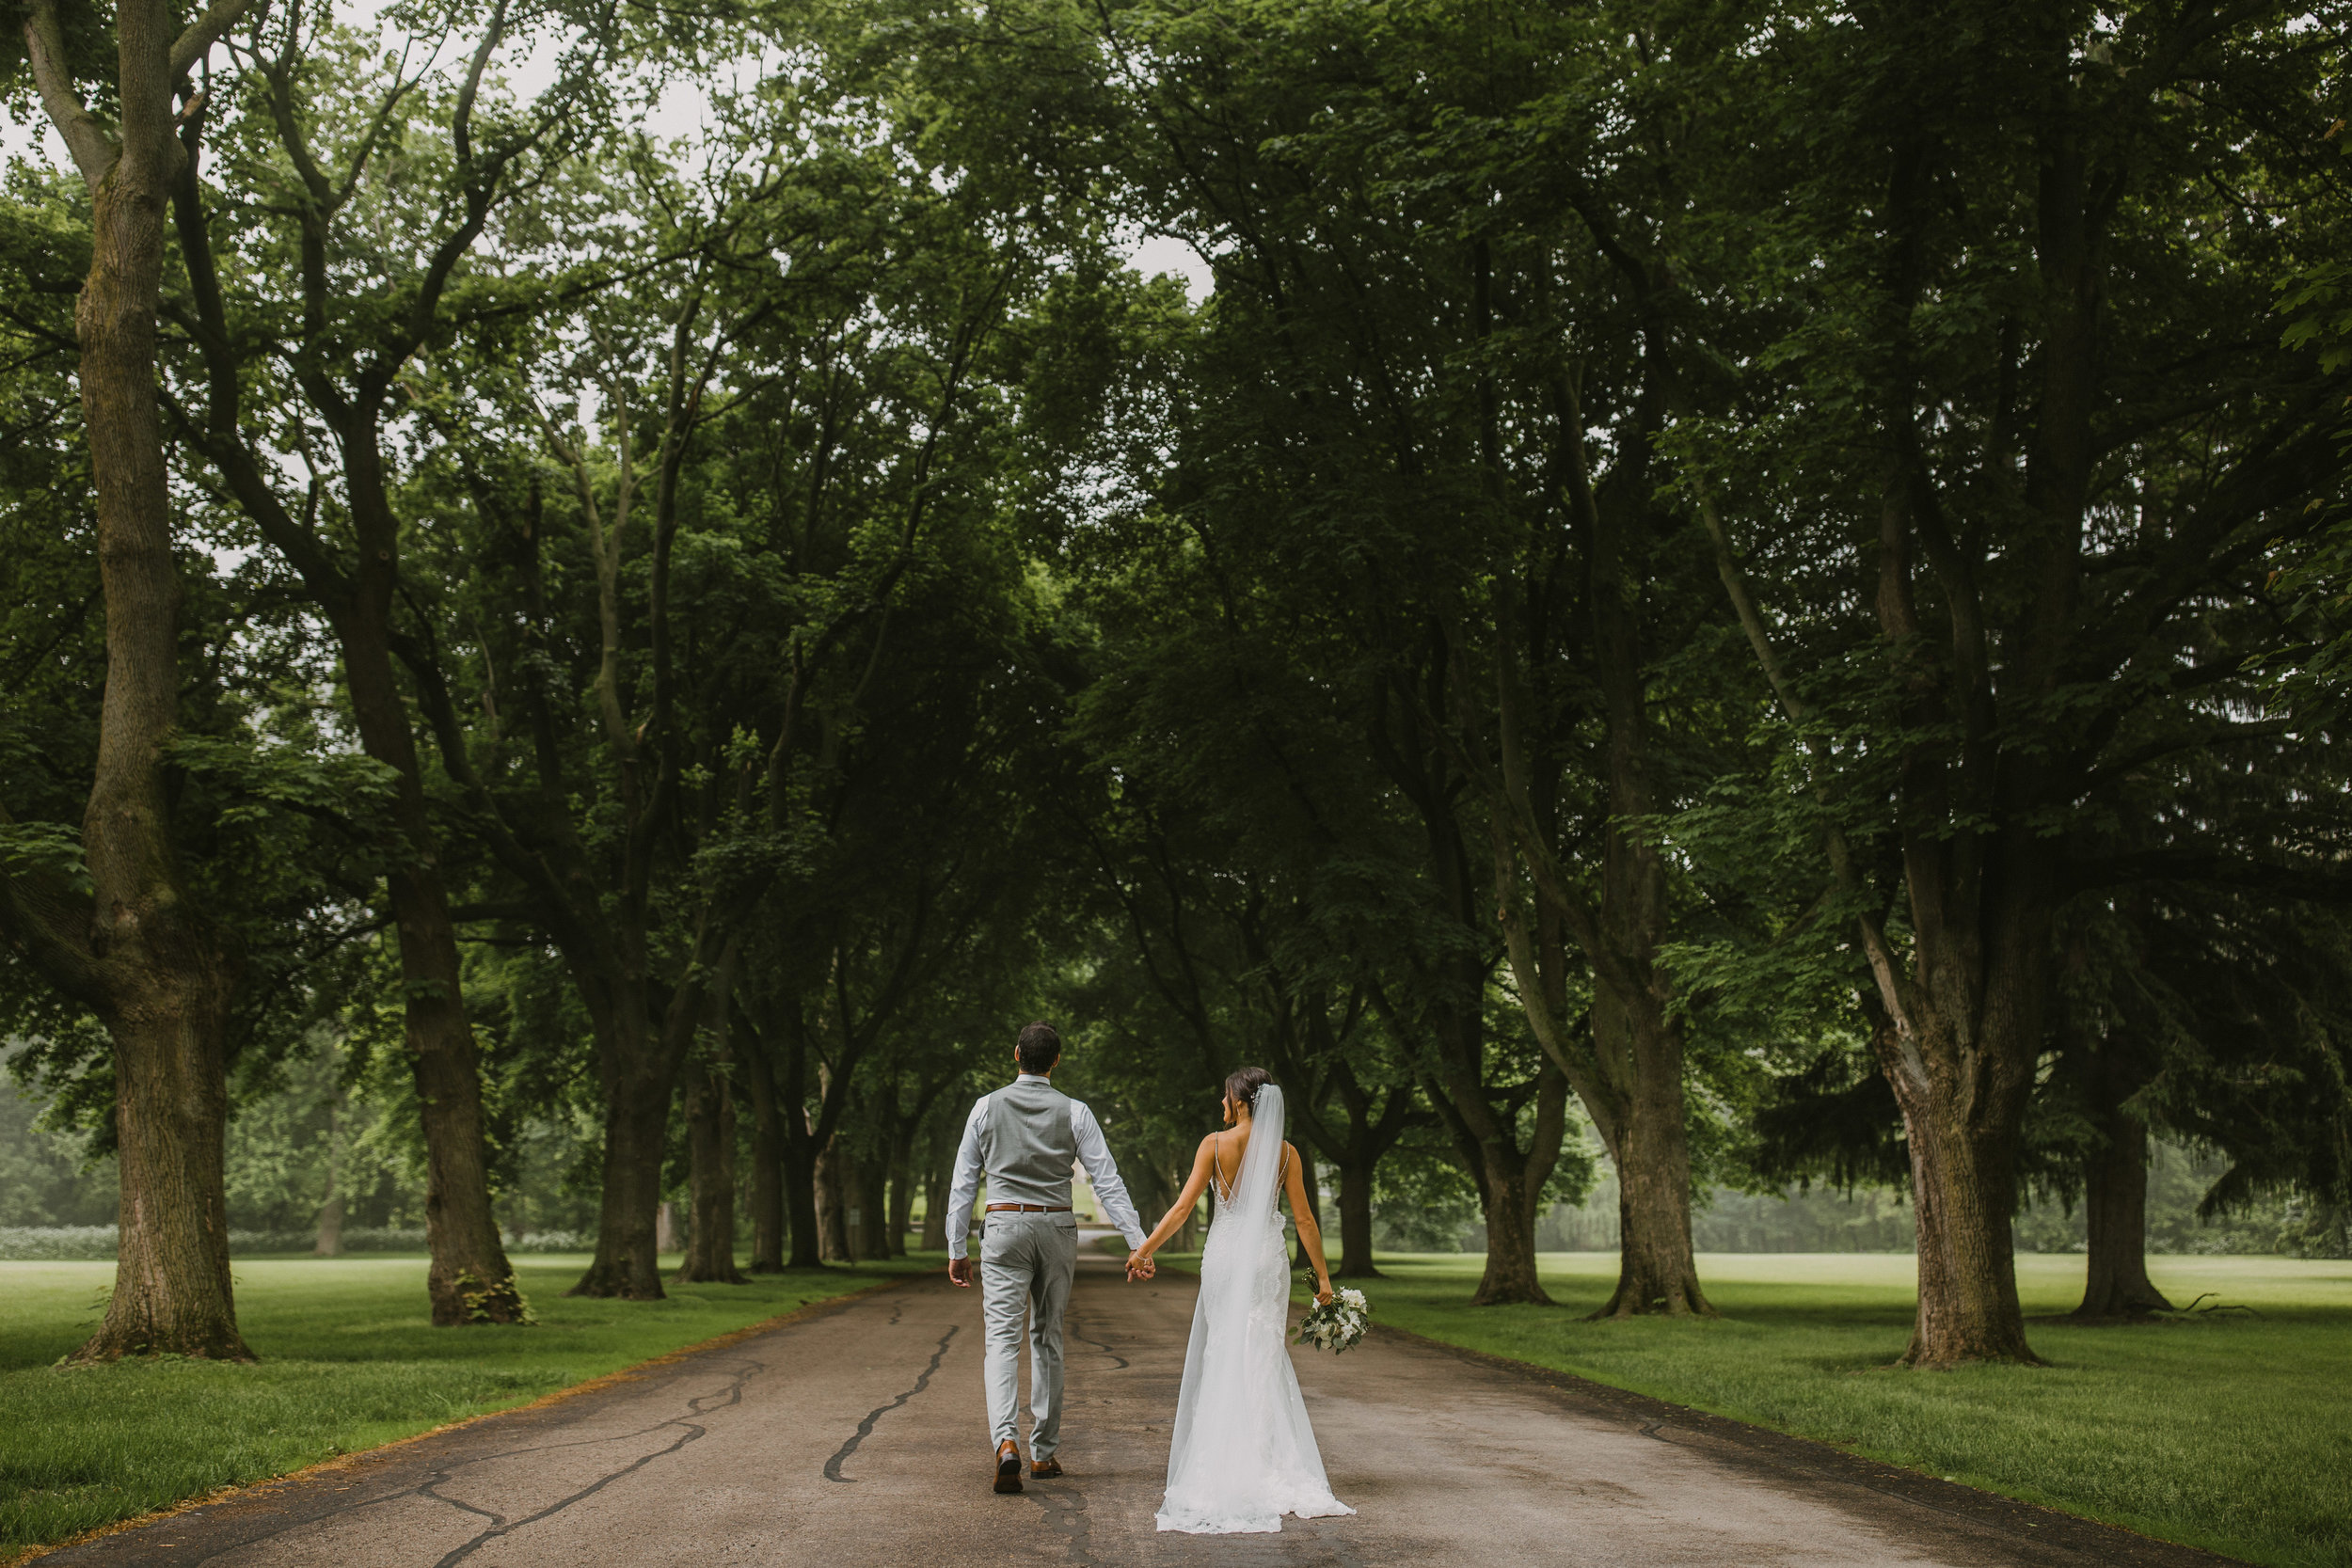 N&S-Milwaukee Wedding Photographer Videographer-650.jpg